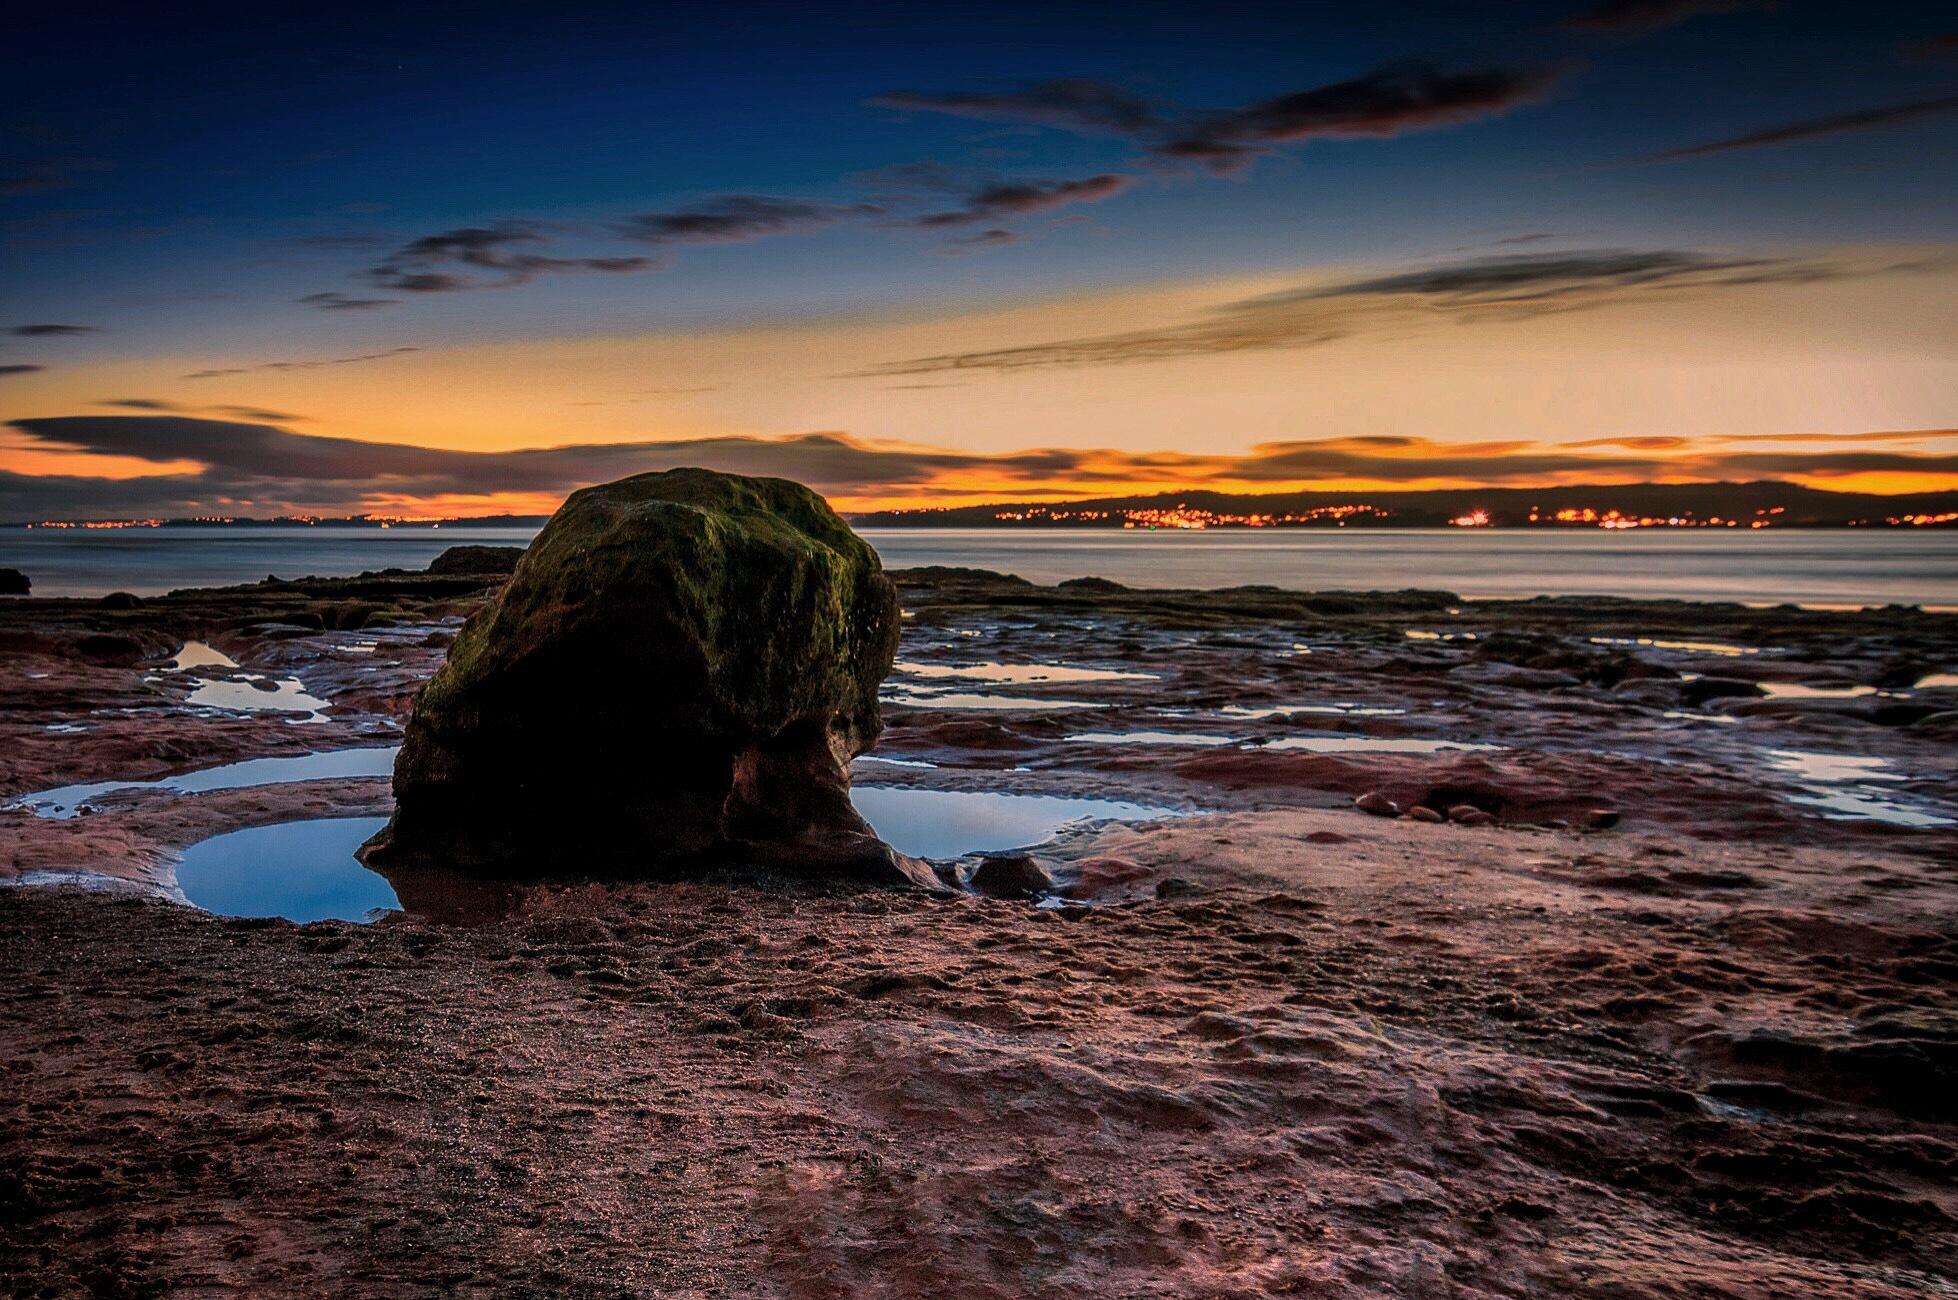 Exmouth beach uk by Achref ghanmi